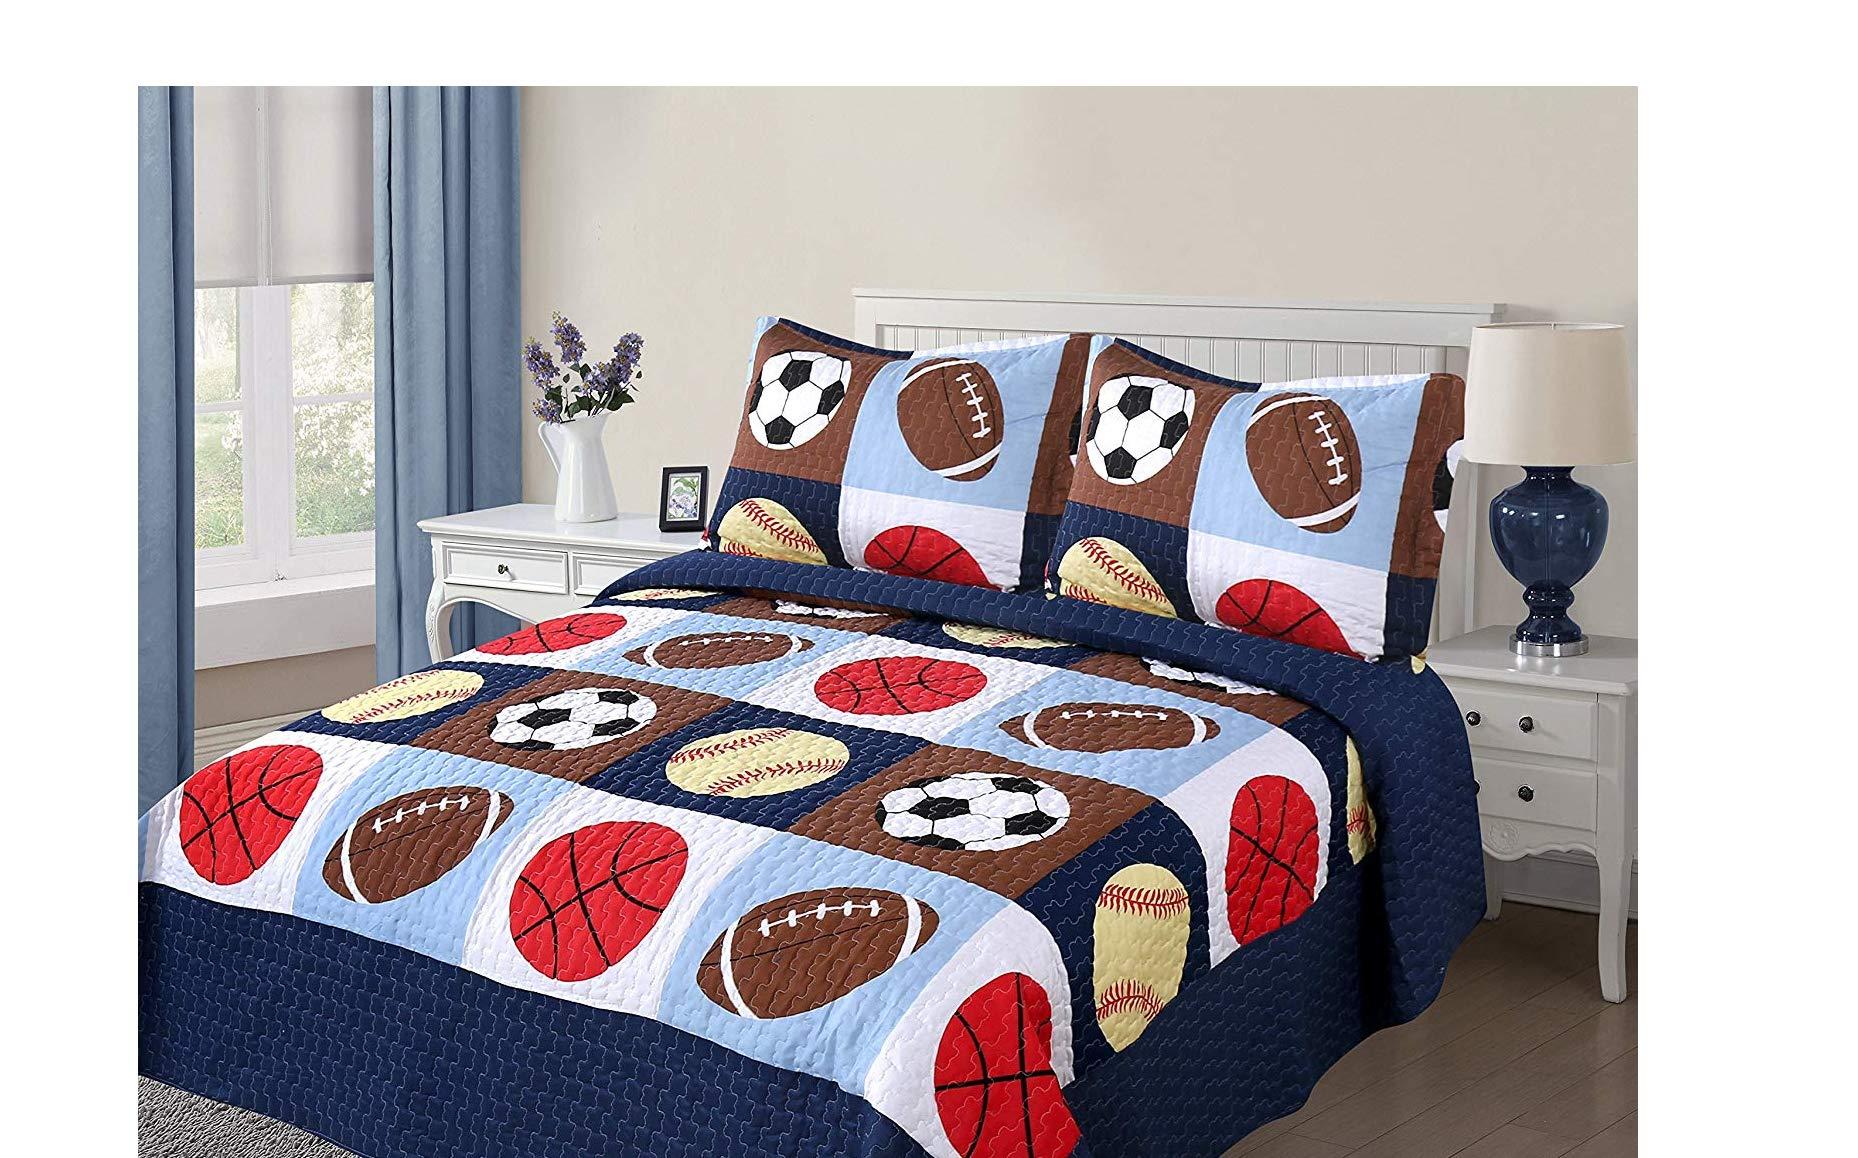 Golden Linens 3 pieces Full Size Quilt Bedspread Set Kids Sports Basketball Football Baseball For Boys & Girls (Full) by Goldenlinens